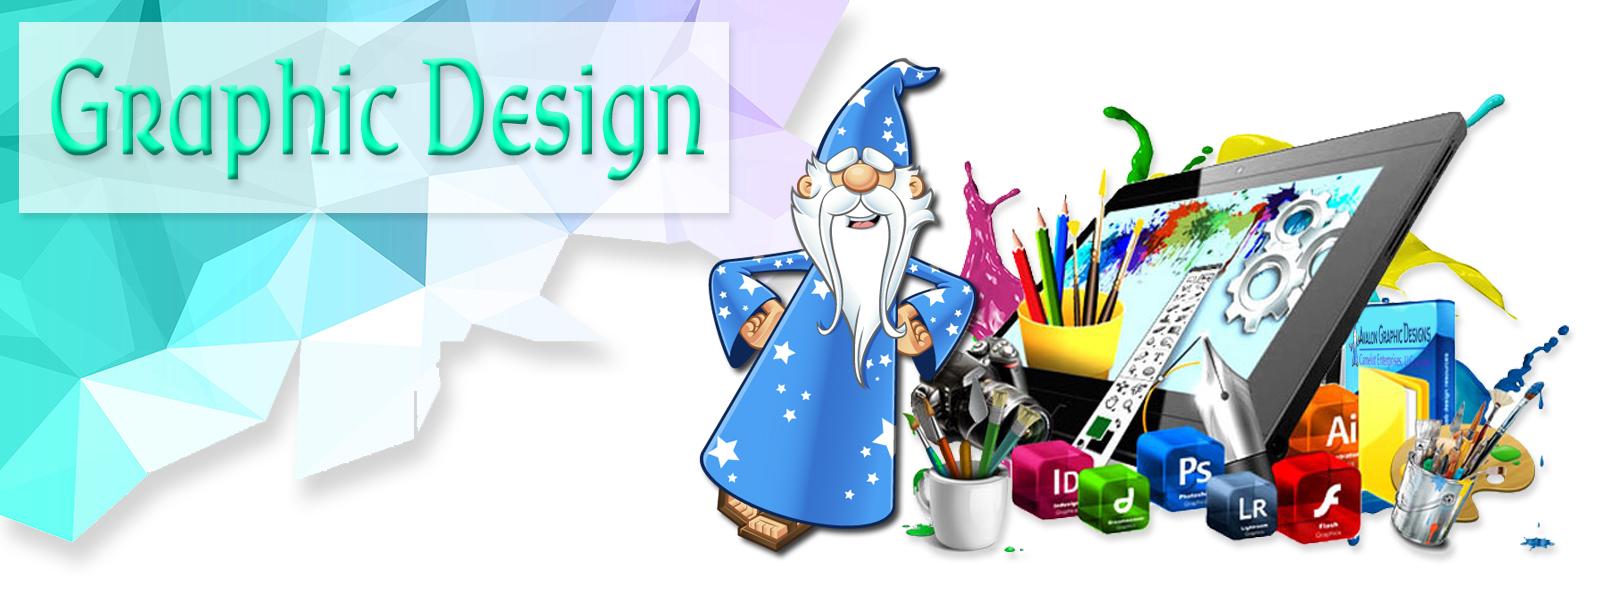 KJ's Art Studio | KJsArtStudio.com | Digital and Graphic Design Services